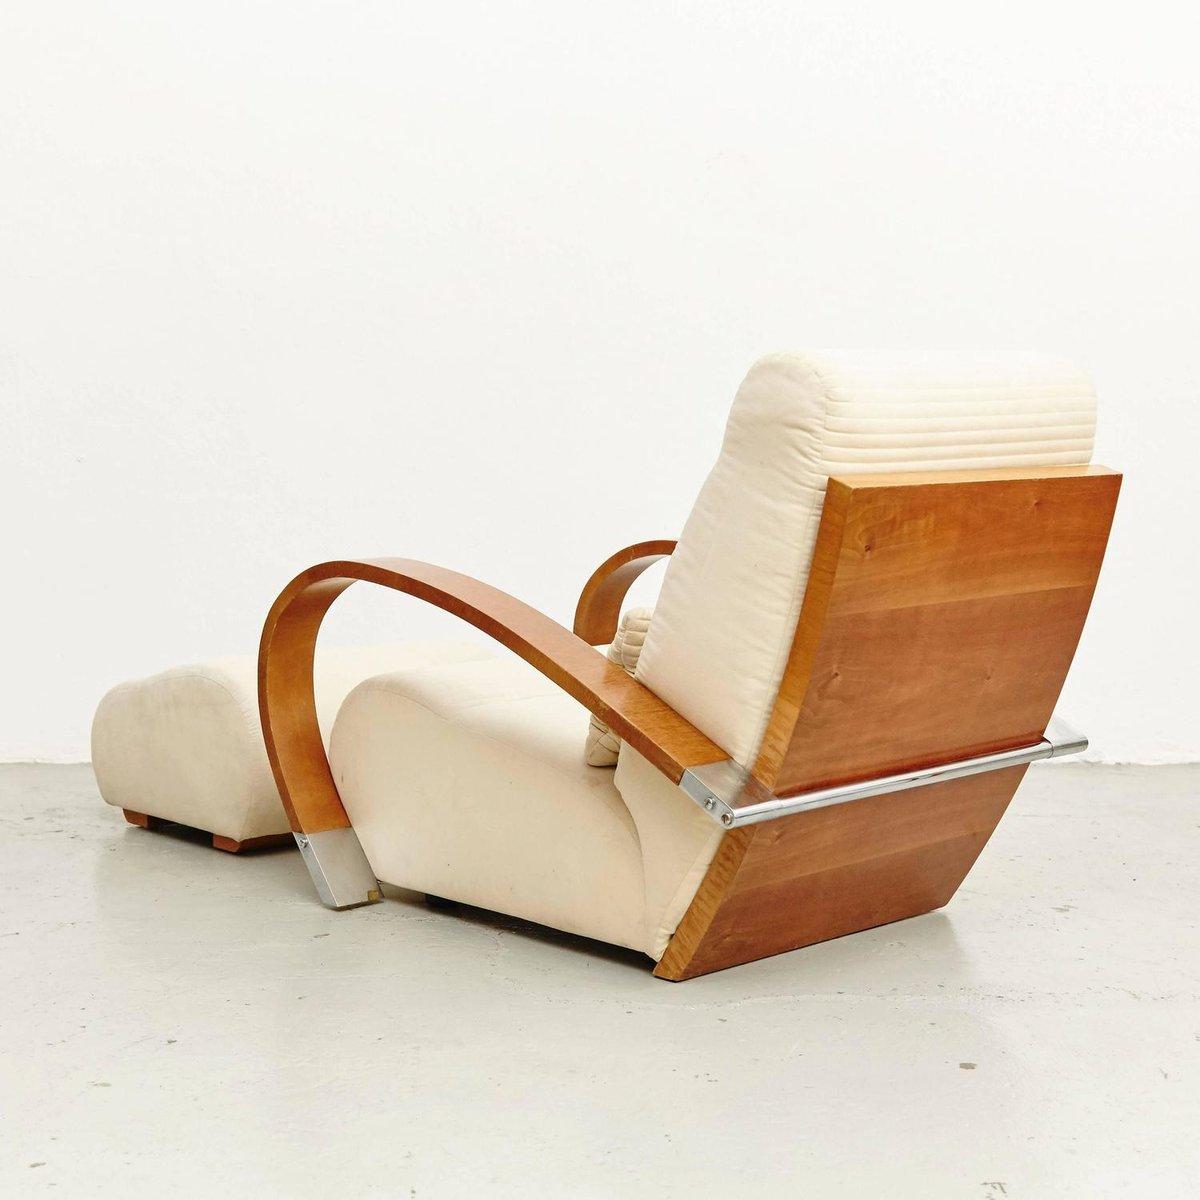 Spanish Casablanca Armchair And Footrest From Jaime